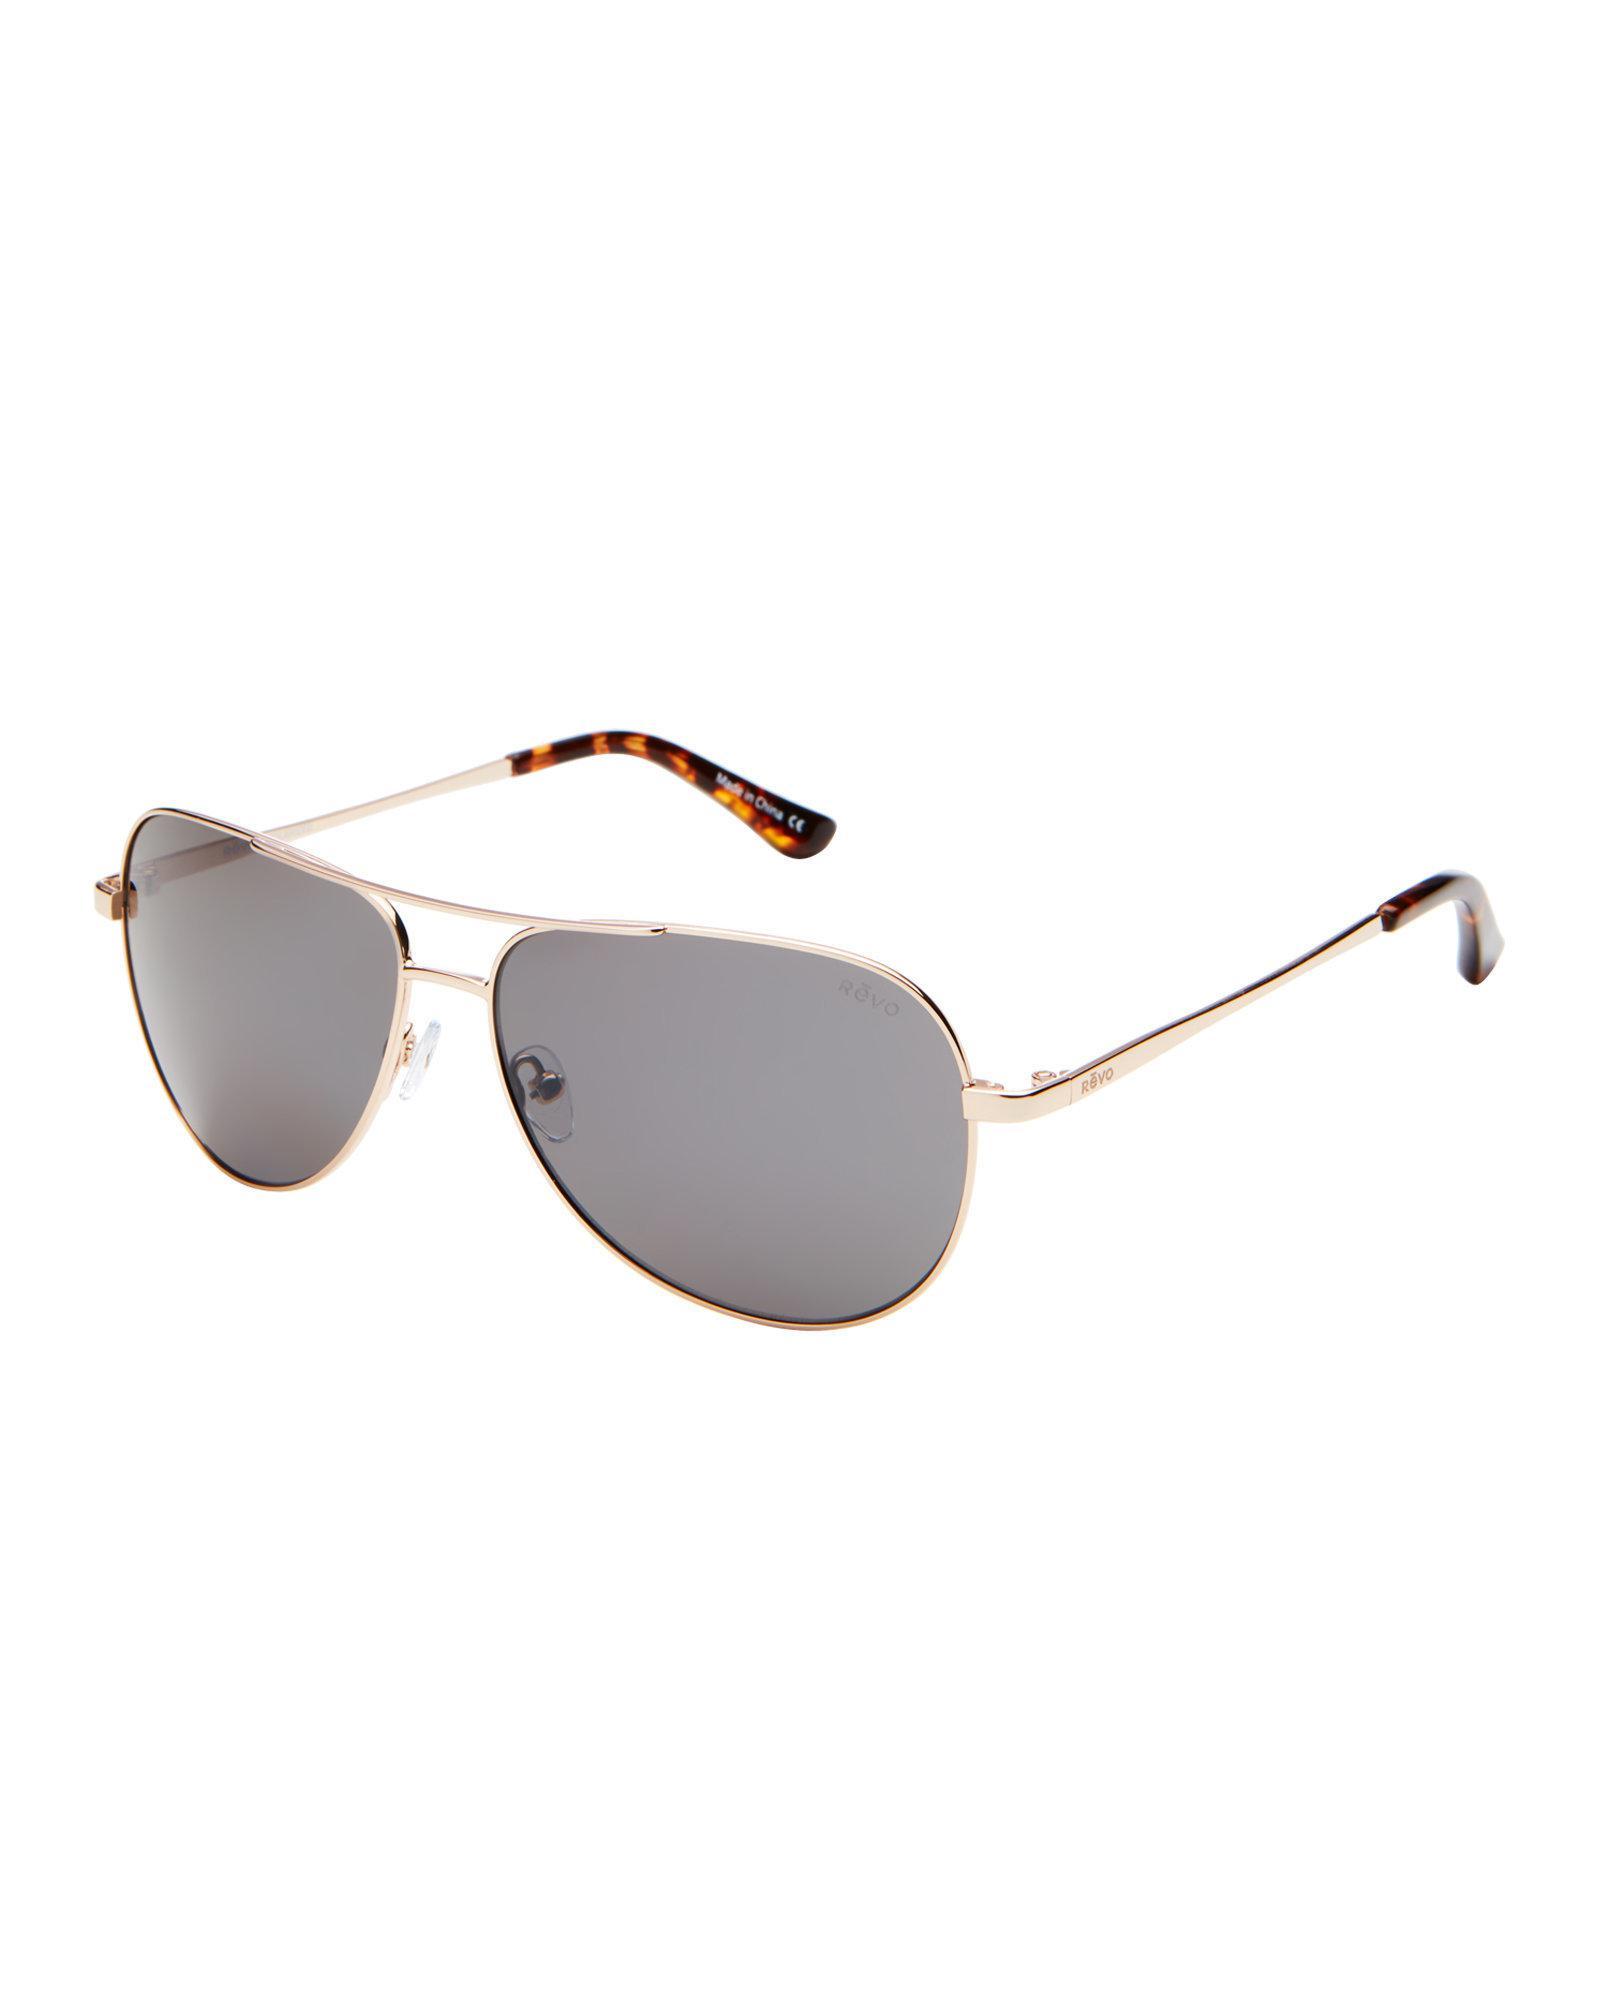 7a78056254d Lyst - Revo Re5015 Gold-tone Johnston Polarized Aviator Sunglasses ...